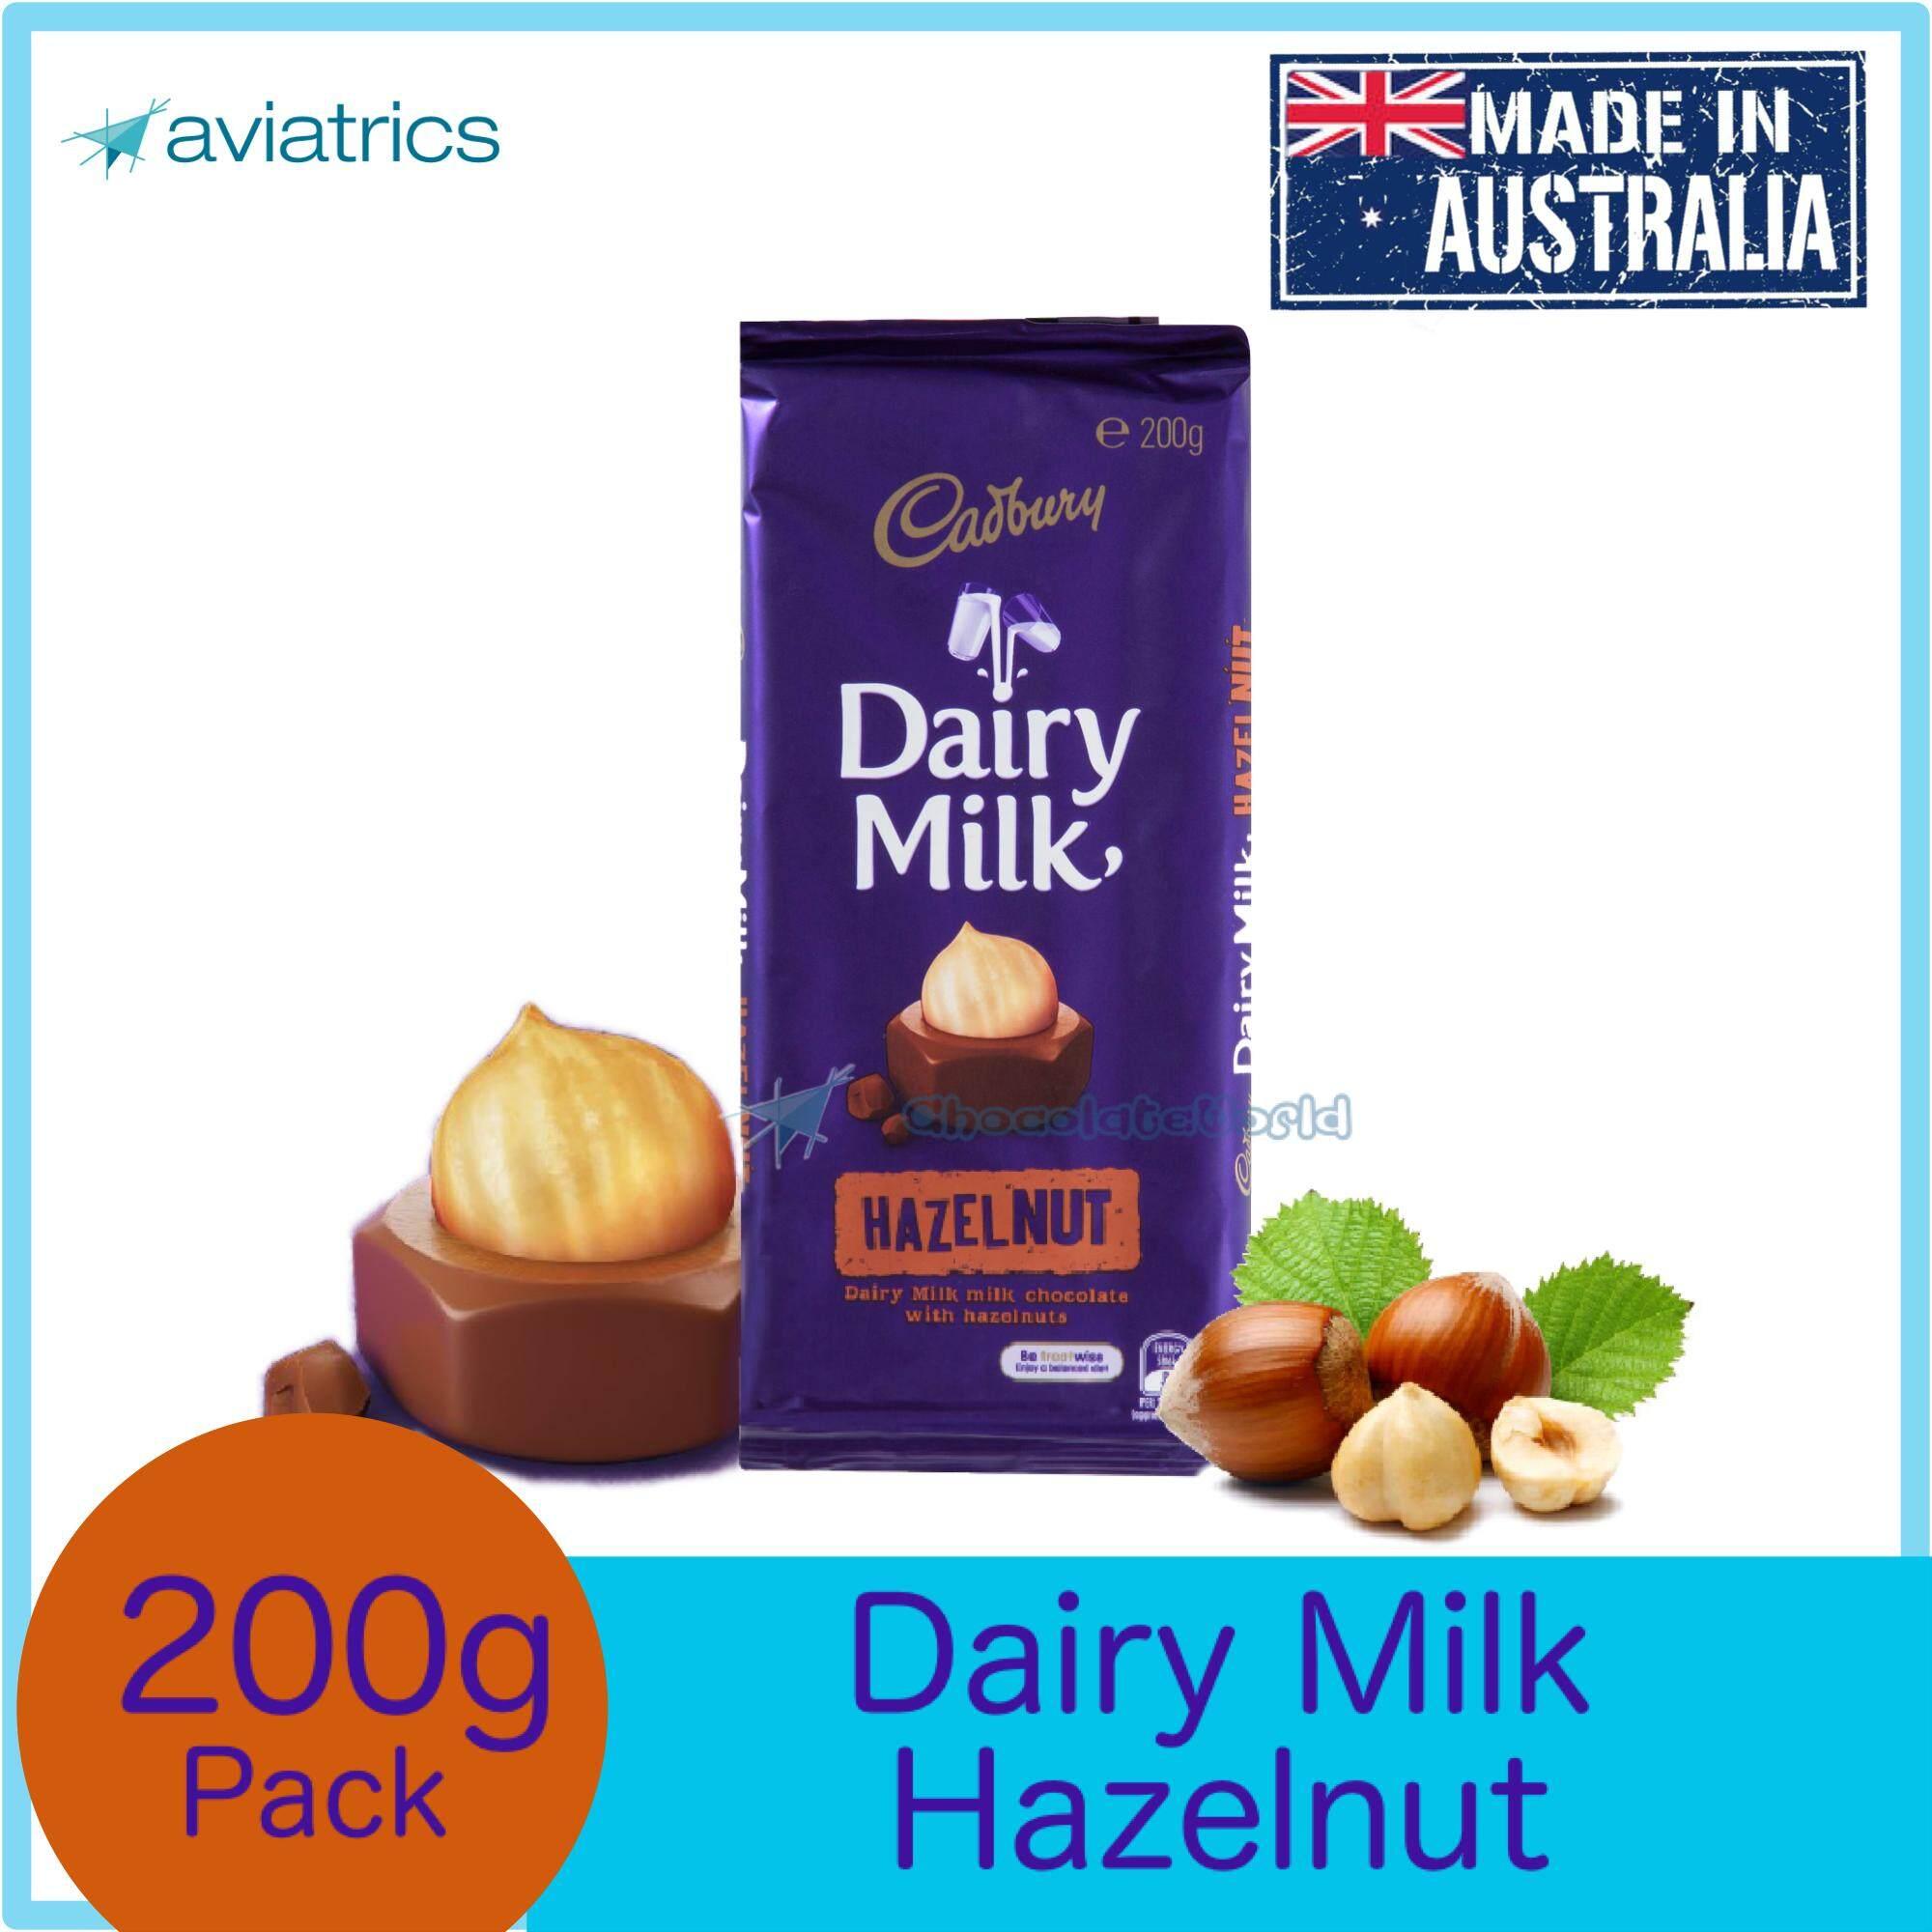 Cadbury Dairy Milk Hazelnut 180g (Made in Australia)